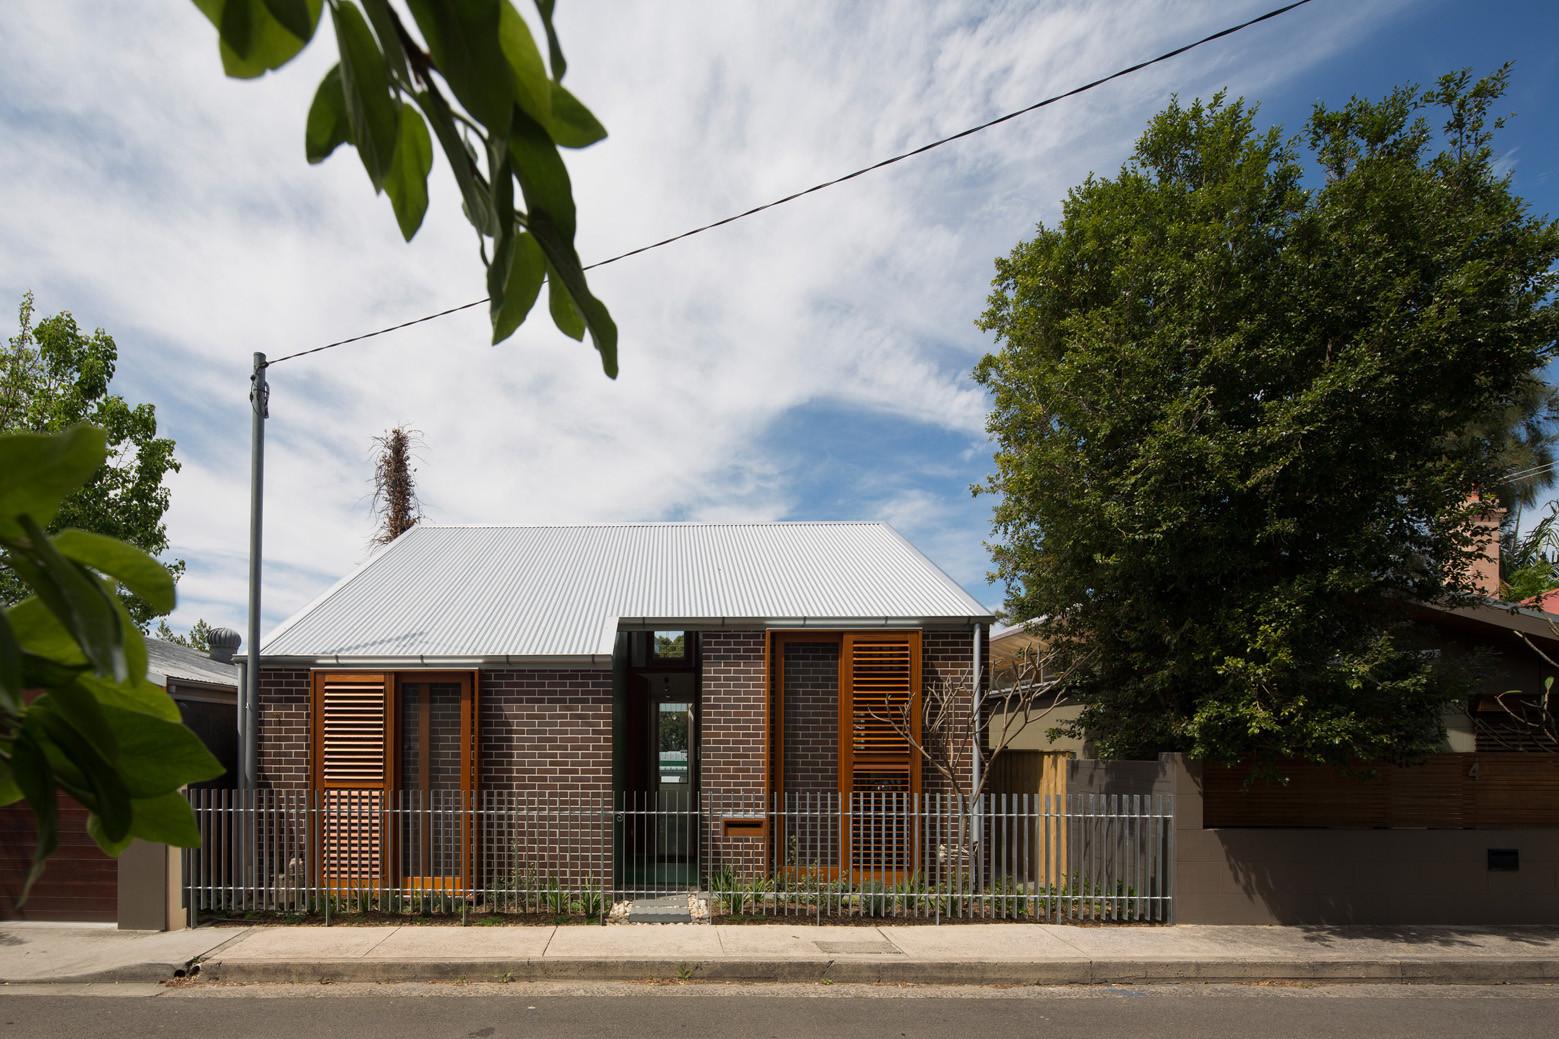 Green House  / Carterwilliamson architects, Courtesy of Carterwilliamson architects